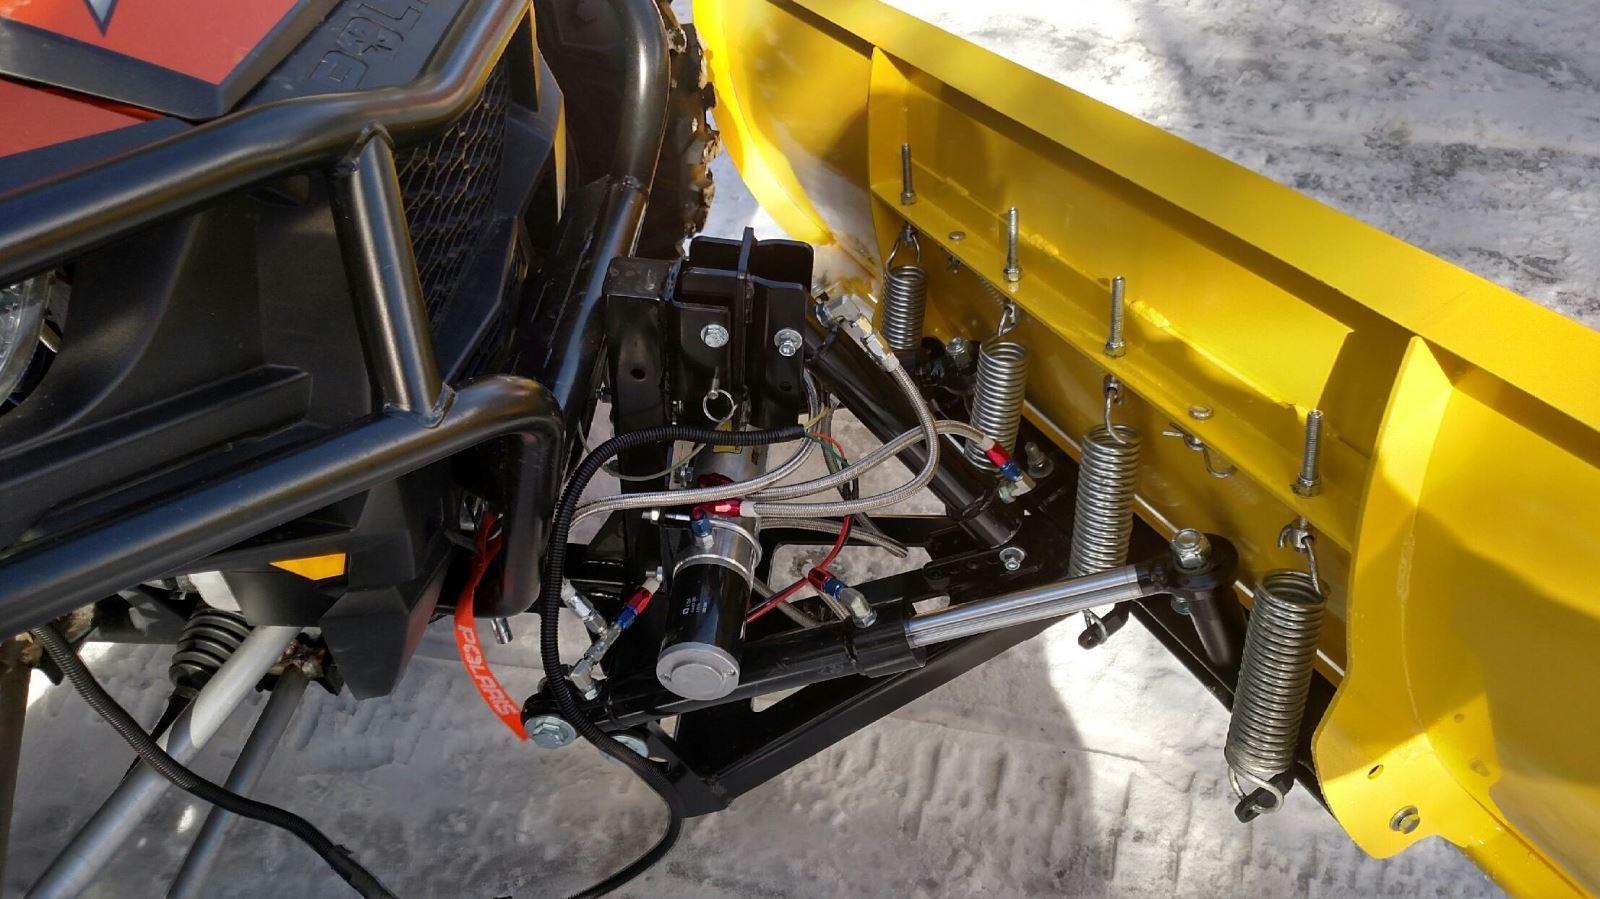 Wicked Bilt Plow Install Hydraulic Moves Plenty Of Snow Dirt Wiring Diagram Besides Polaris 2014 Rzr 900 On Winch Toys Magazine